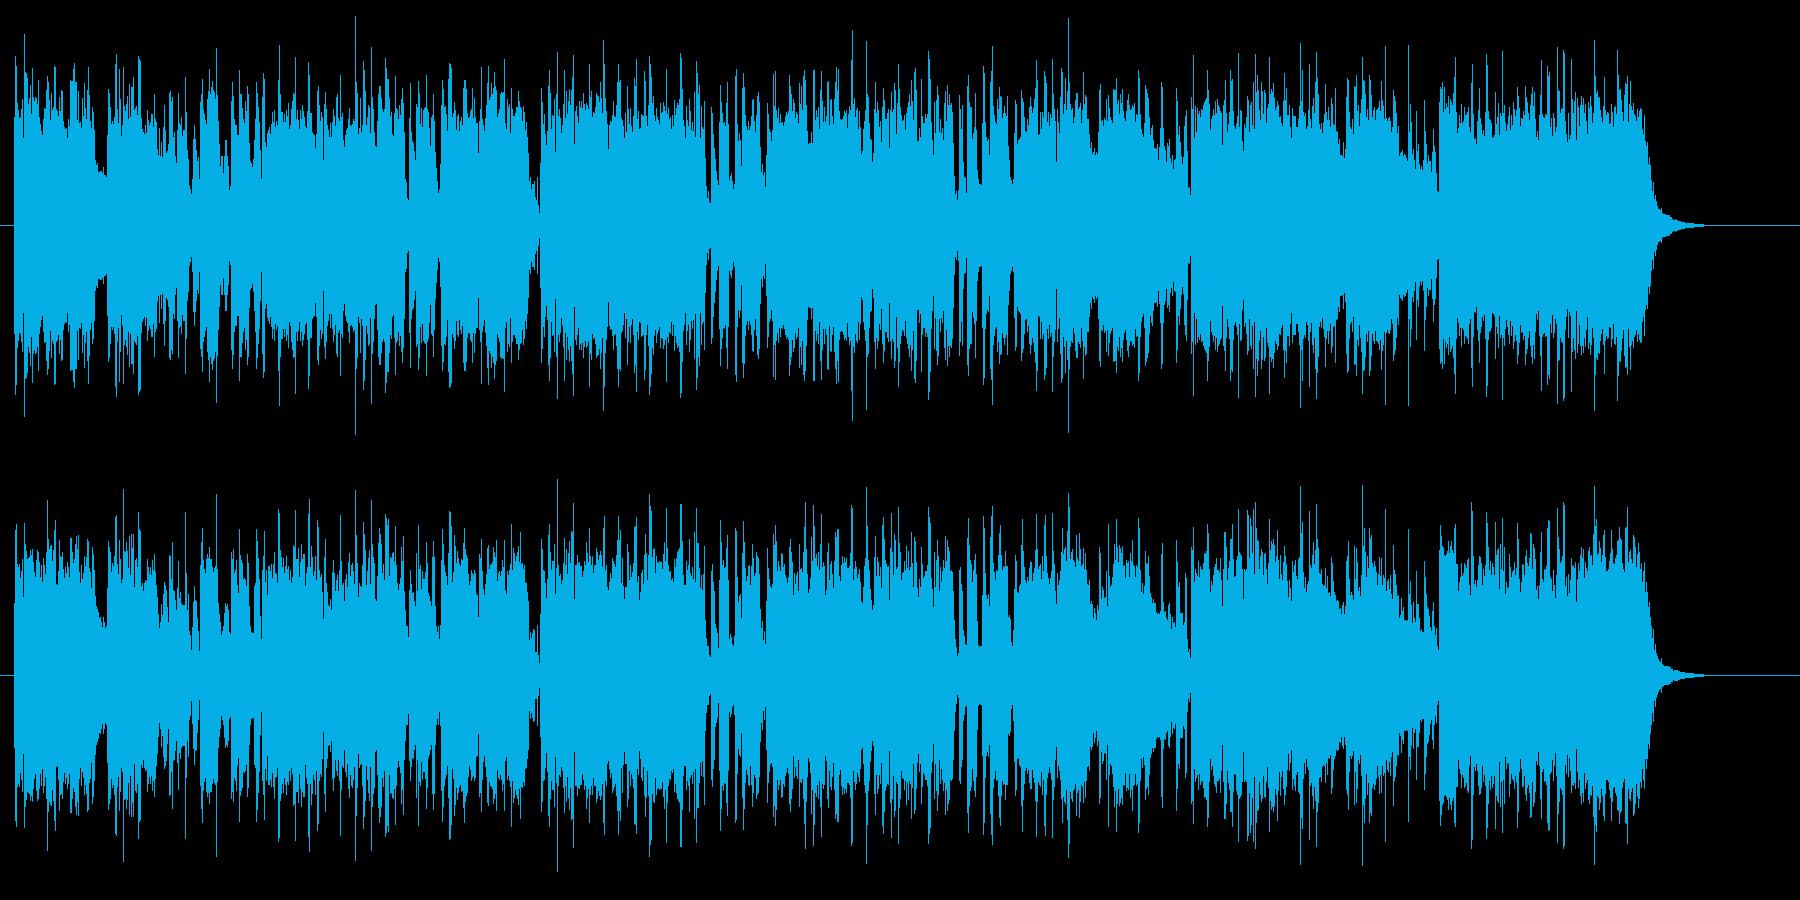 70s西海岸ギターロックの再生済みの波形